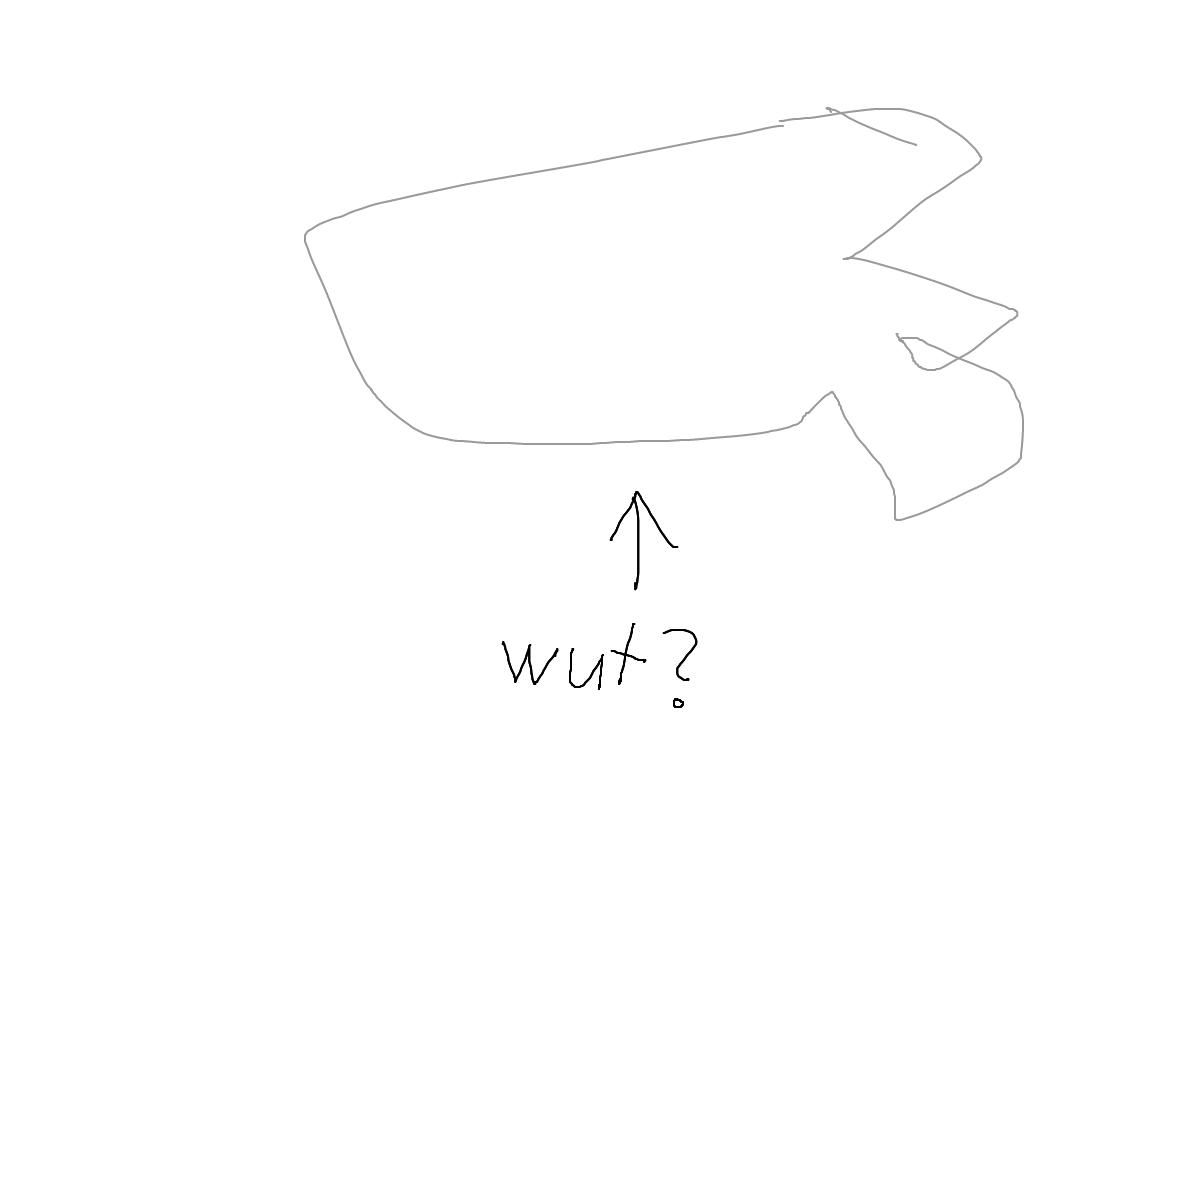 BAAAM drawing#252 lat:40.7131919860839840lng: -74.0122604370117200